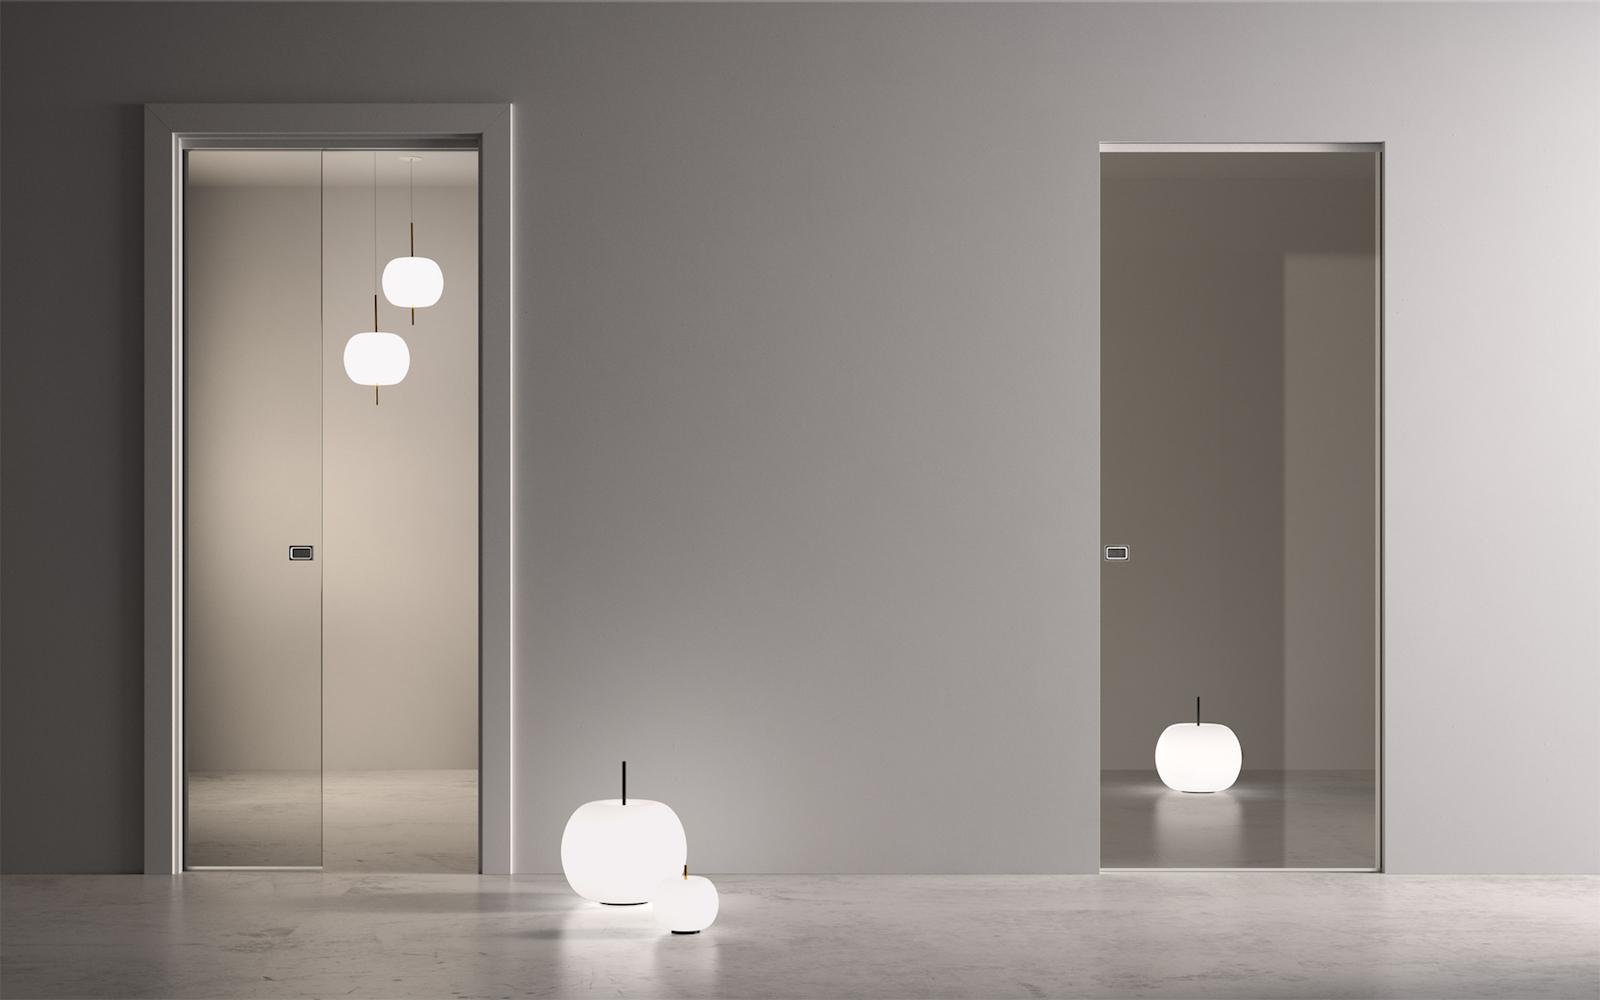 la porte coulissante garofoli un esprit d 39 ouverture garofoli. Black Bedroom Furniture Sets. Home Design Ideas